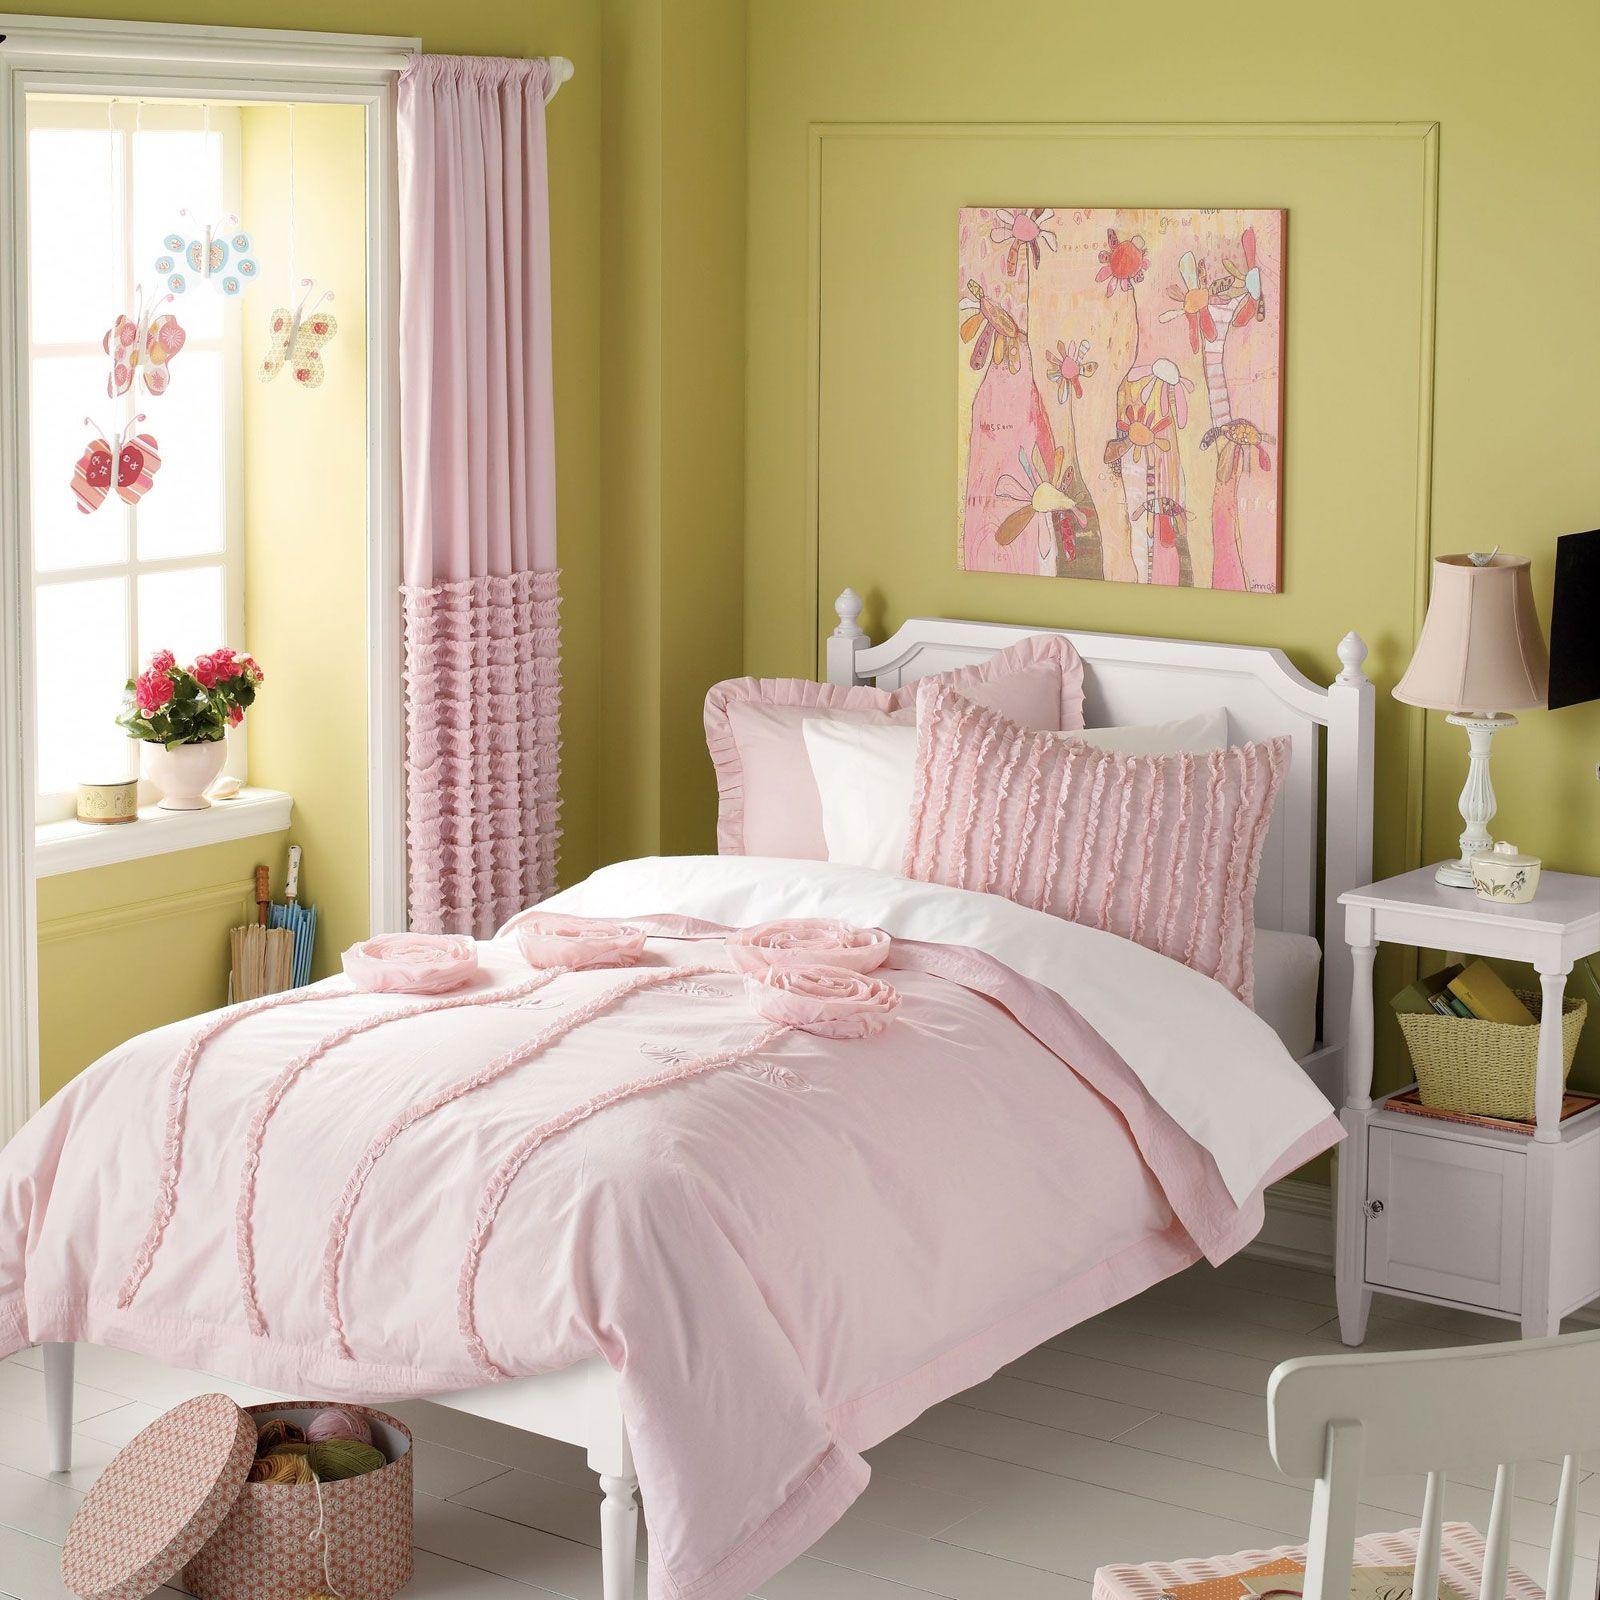 cool aqua for pin girls teal curtain curtains girl room bedroom blackout tween teen corner lighted embellished